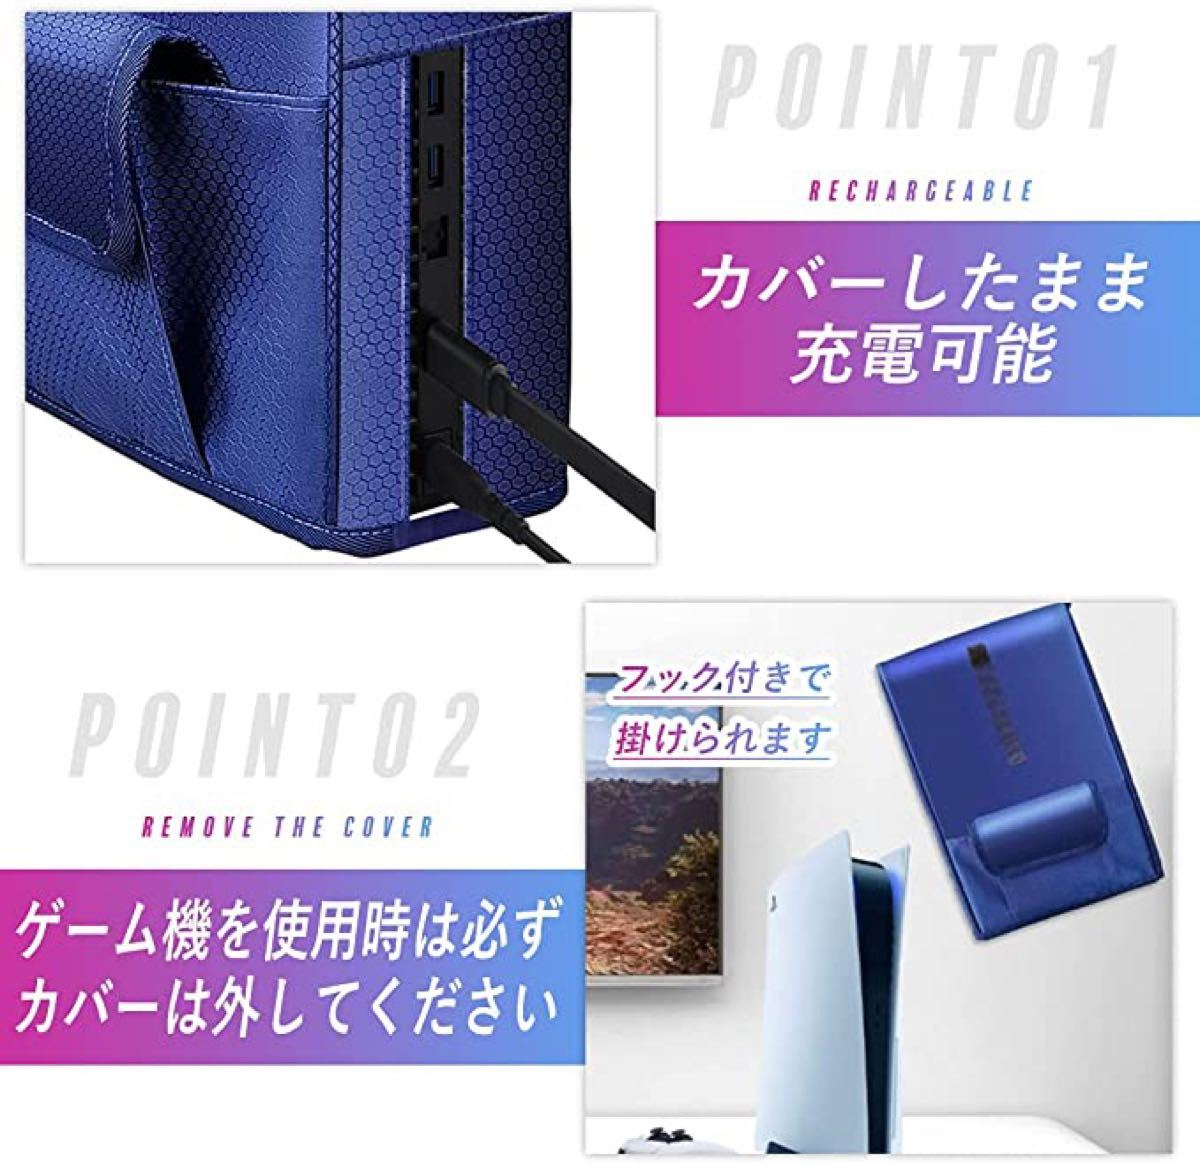 PS5本体カバー ブルーカバー 防塵カバーPlaystation5本体カバー